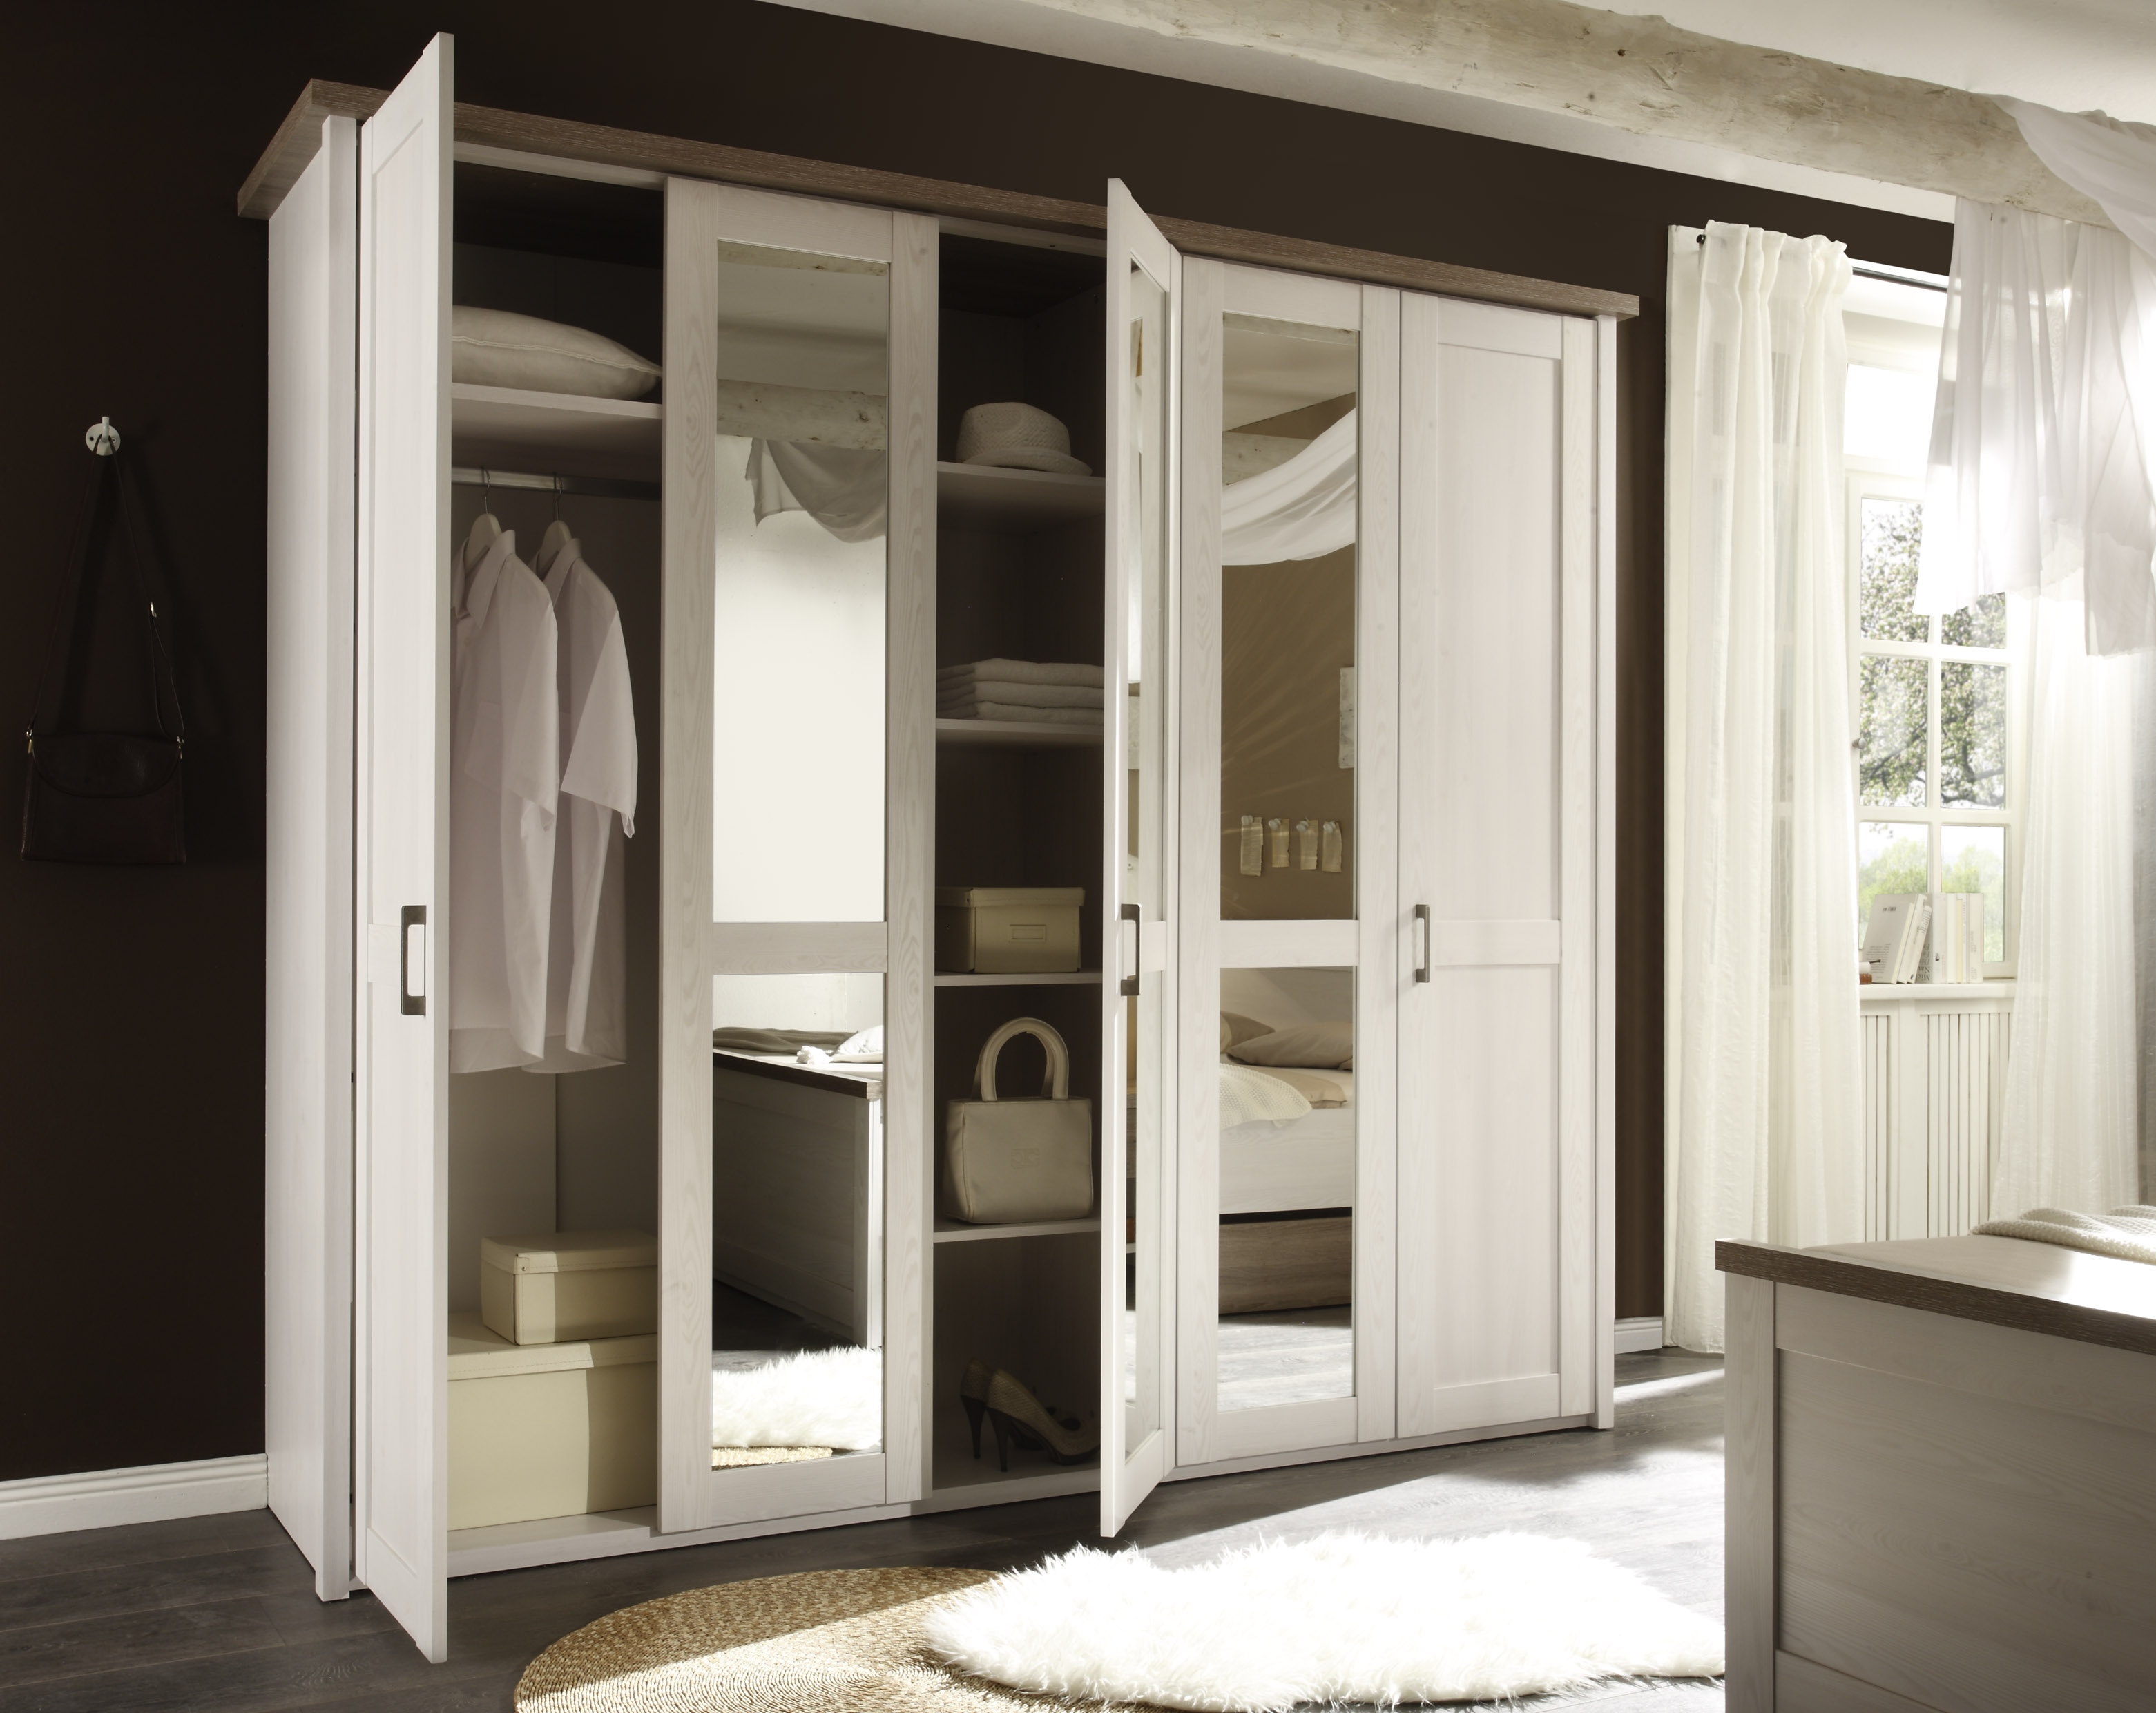 "Schlafzimmer Komplett Set 4-tlg. ""LUCA"" Bett 180 Kleiderschrank kommoden Weiß"